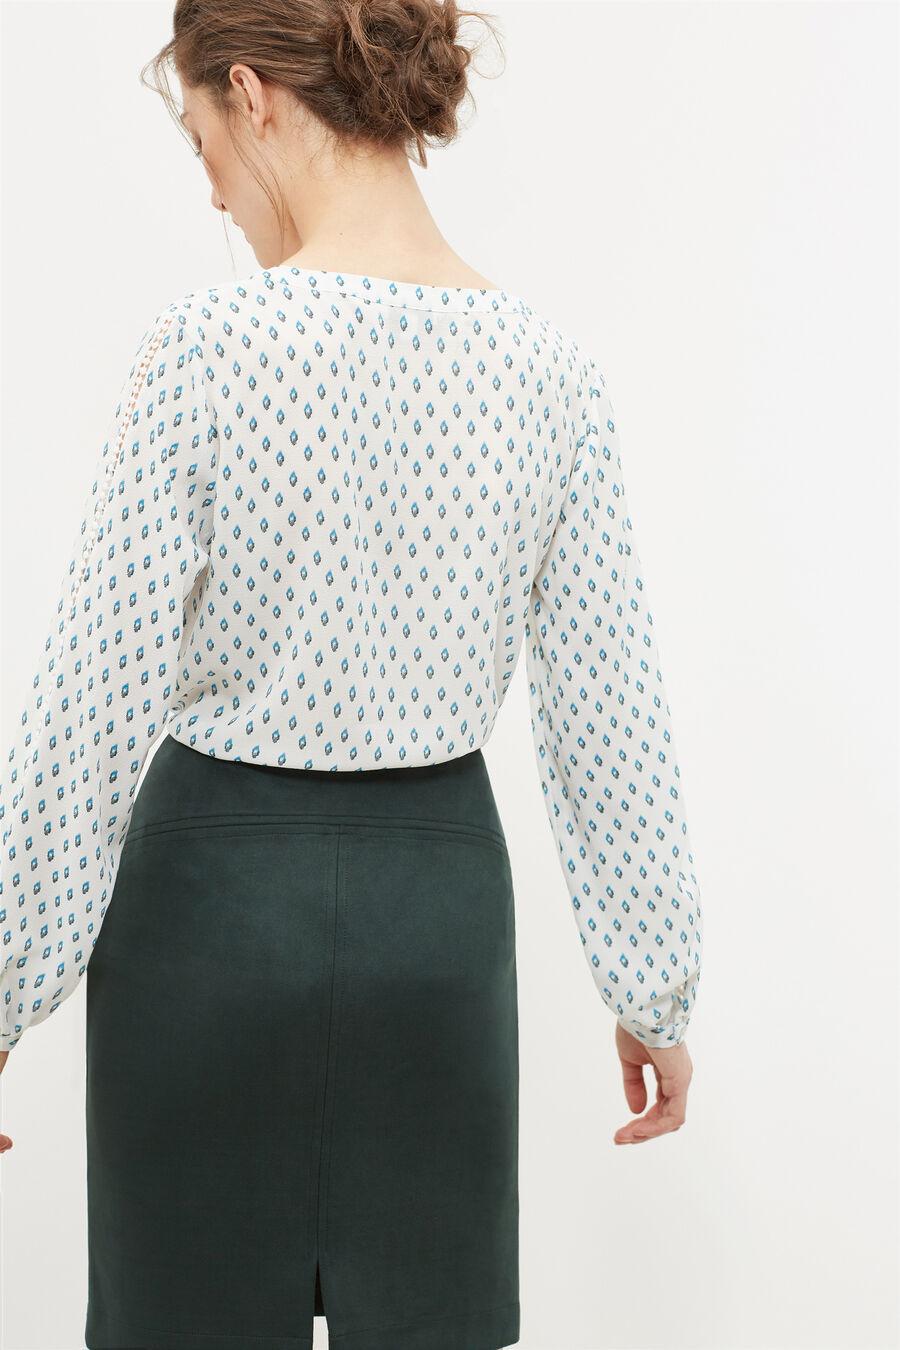 Mao collar blouse